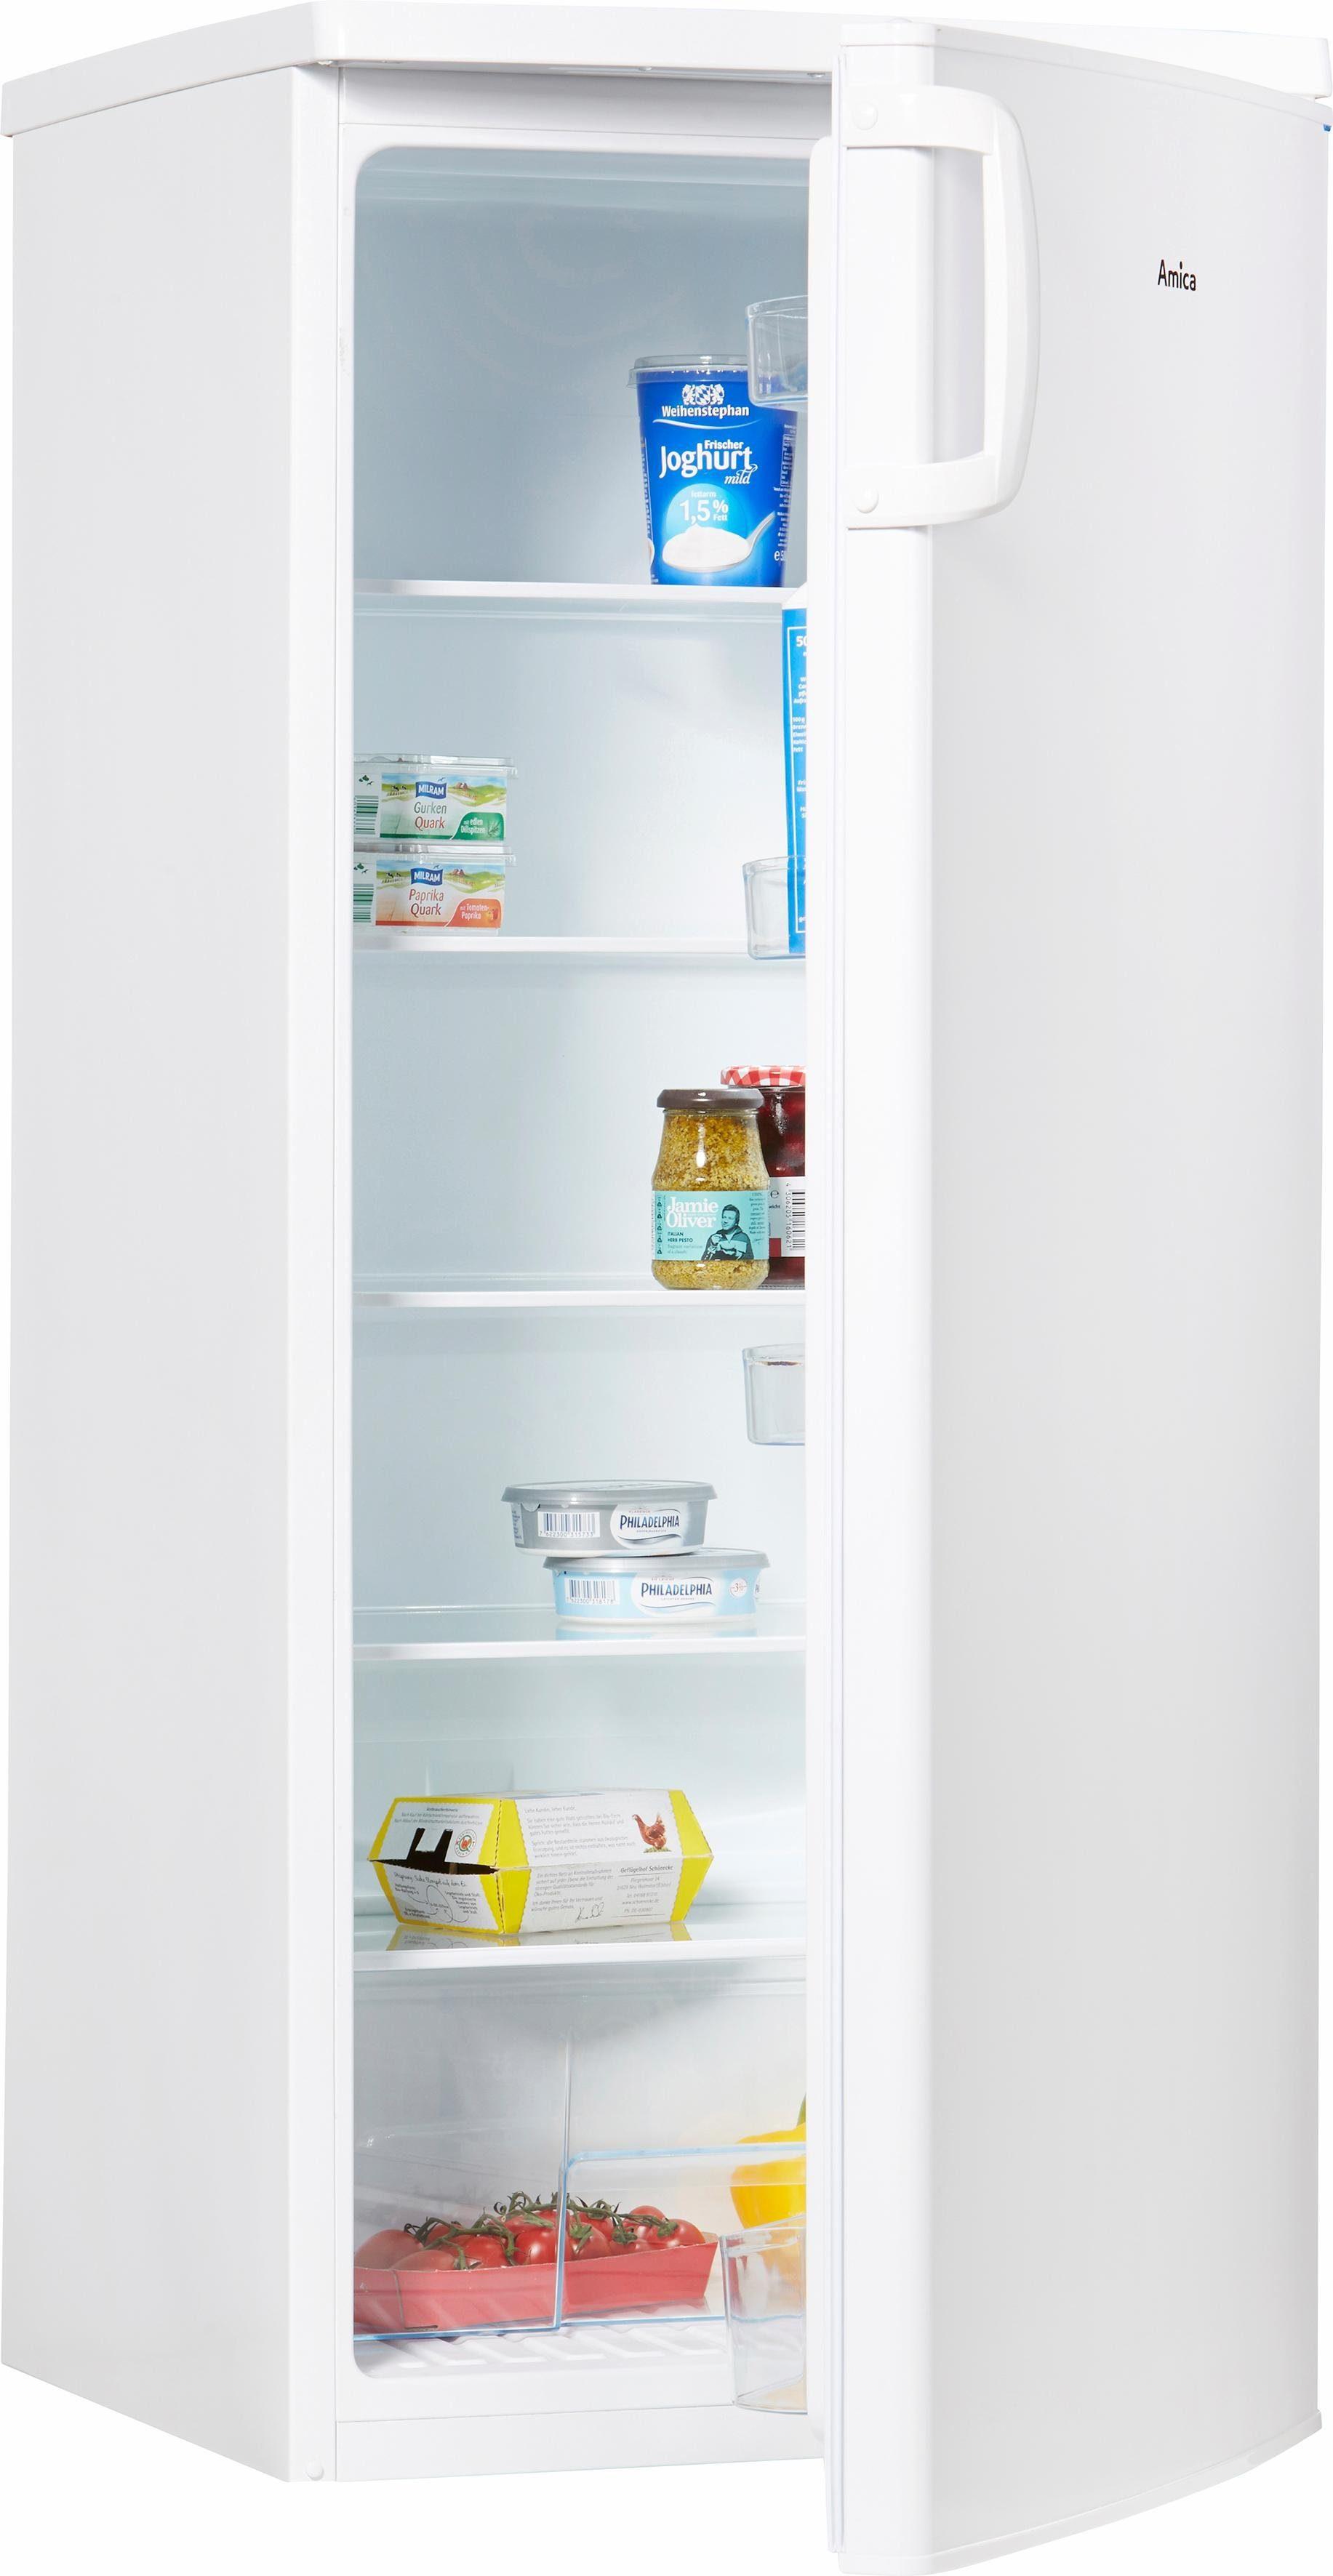 Amica Kühlschrank VKS 15405 W, 125,2 cm hoch, 54,6 cm breit, A++, 125,2 cm hoch